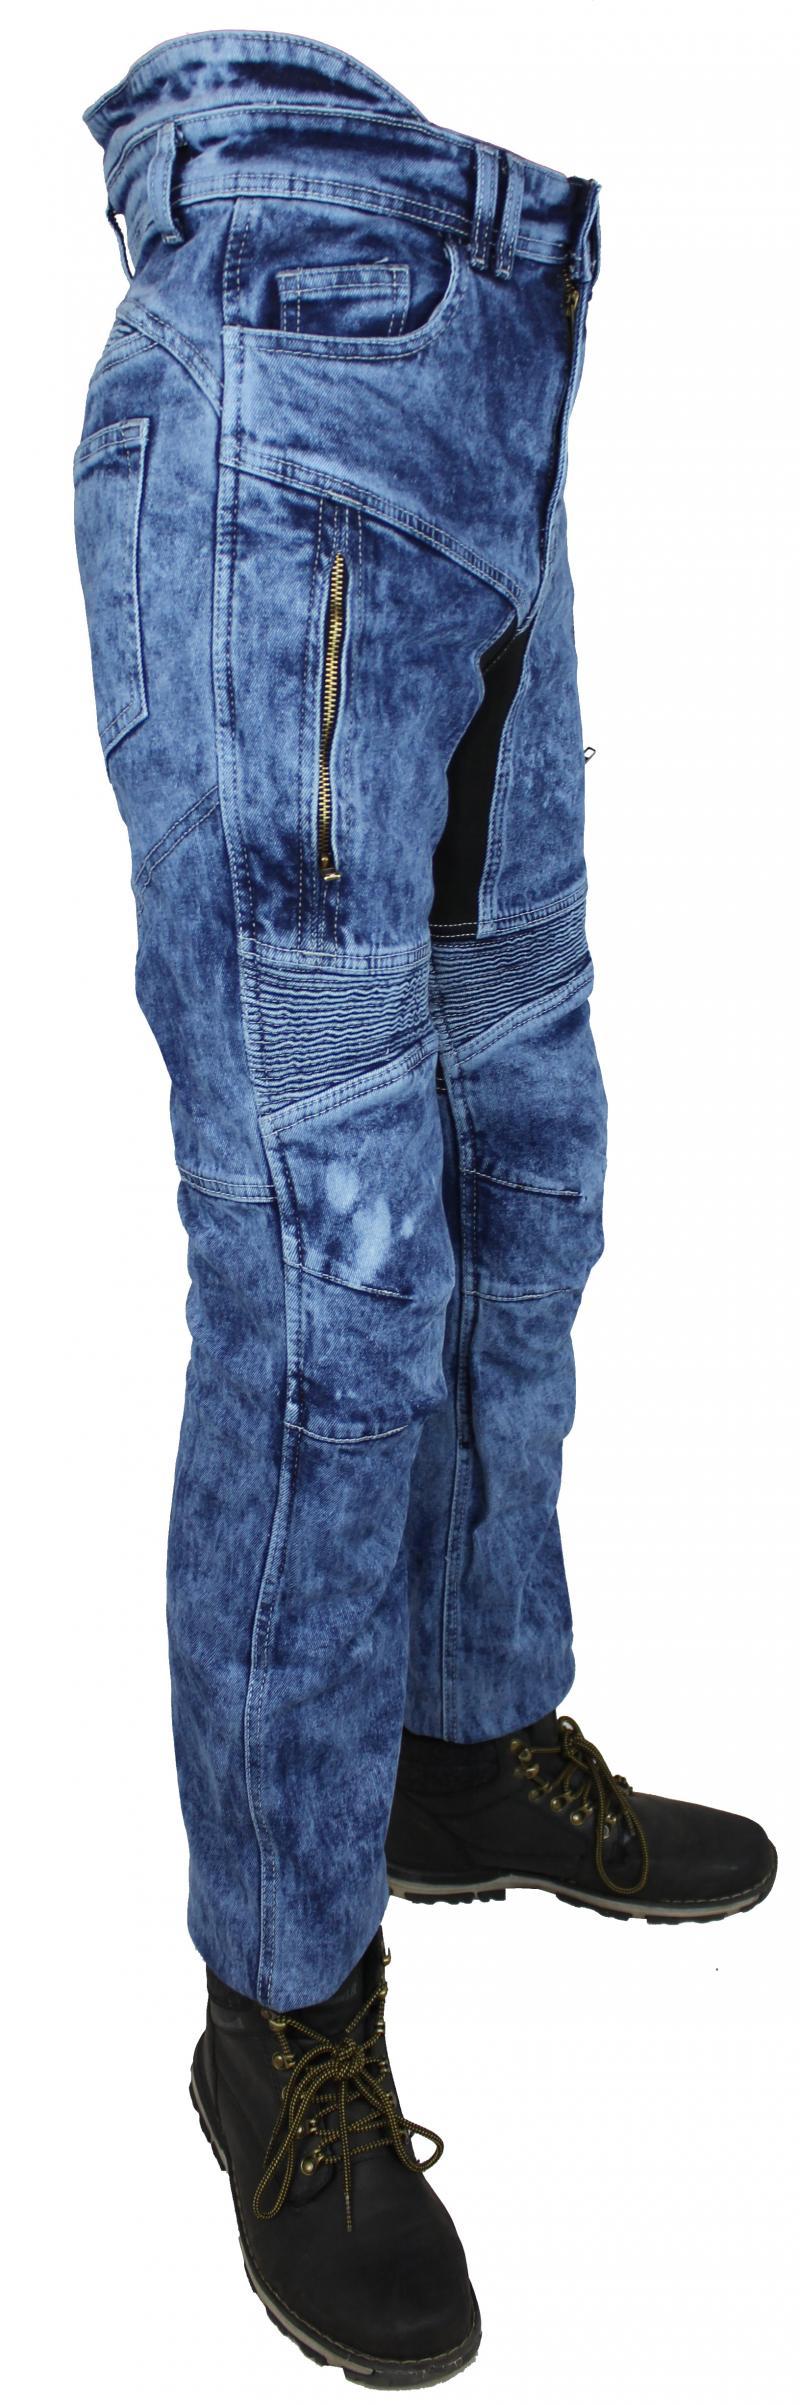 Motorrad Biker Jeans Hose Mit Kev Aramid Protektoren Blau